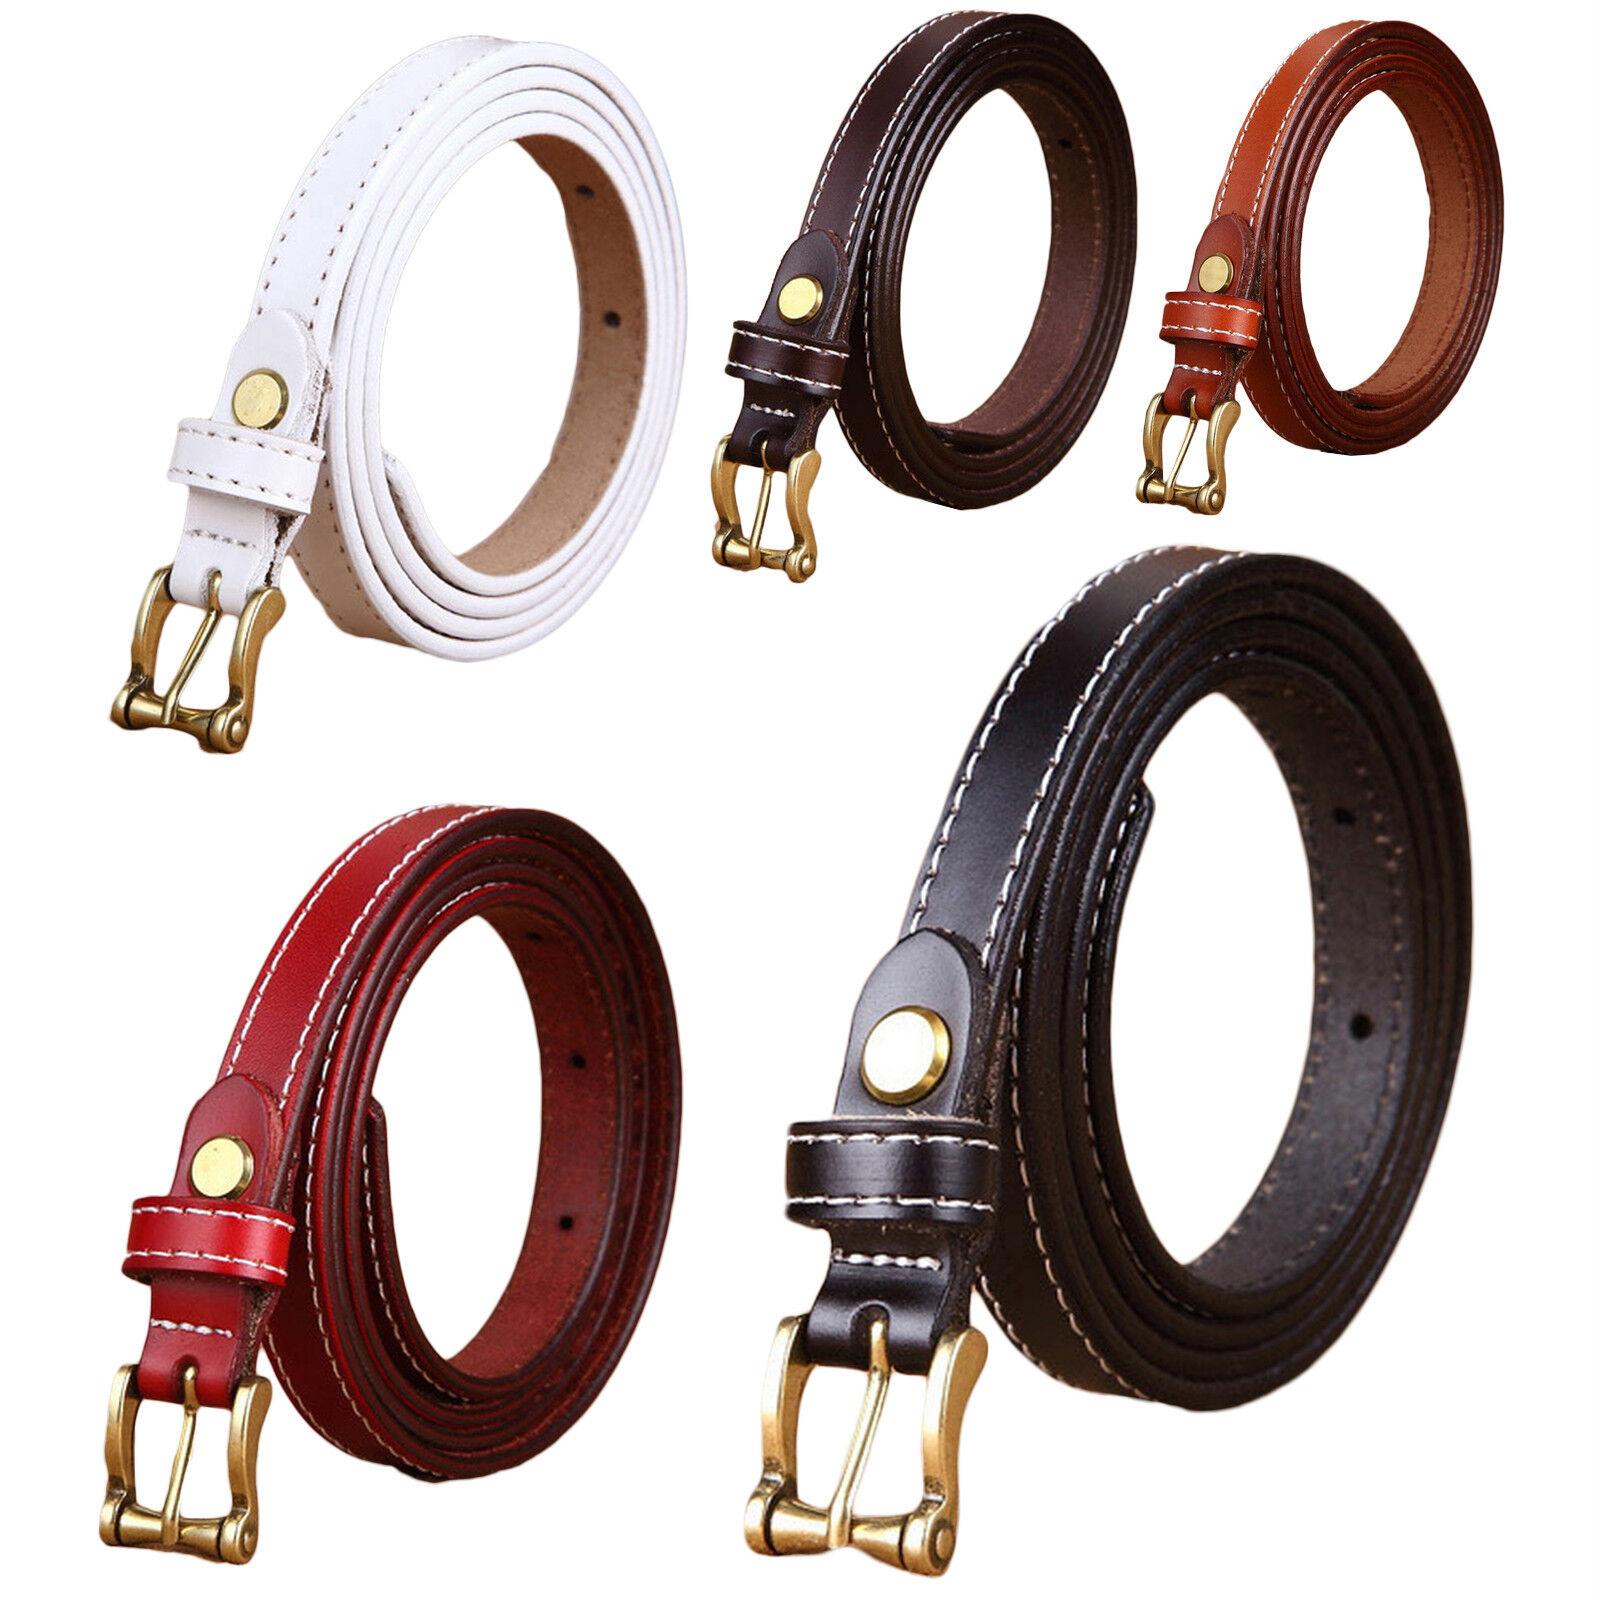 Women's Classic Metal Buckle Handcrafted Genuine Leather Skinny Belt Belts